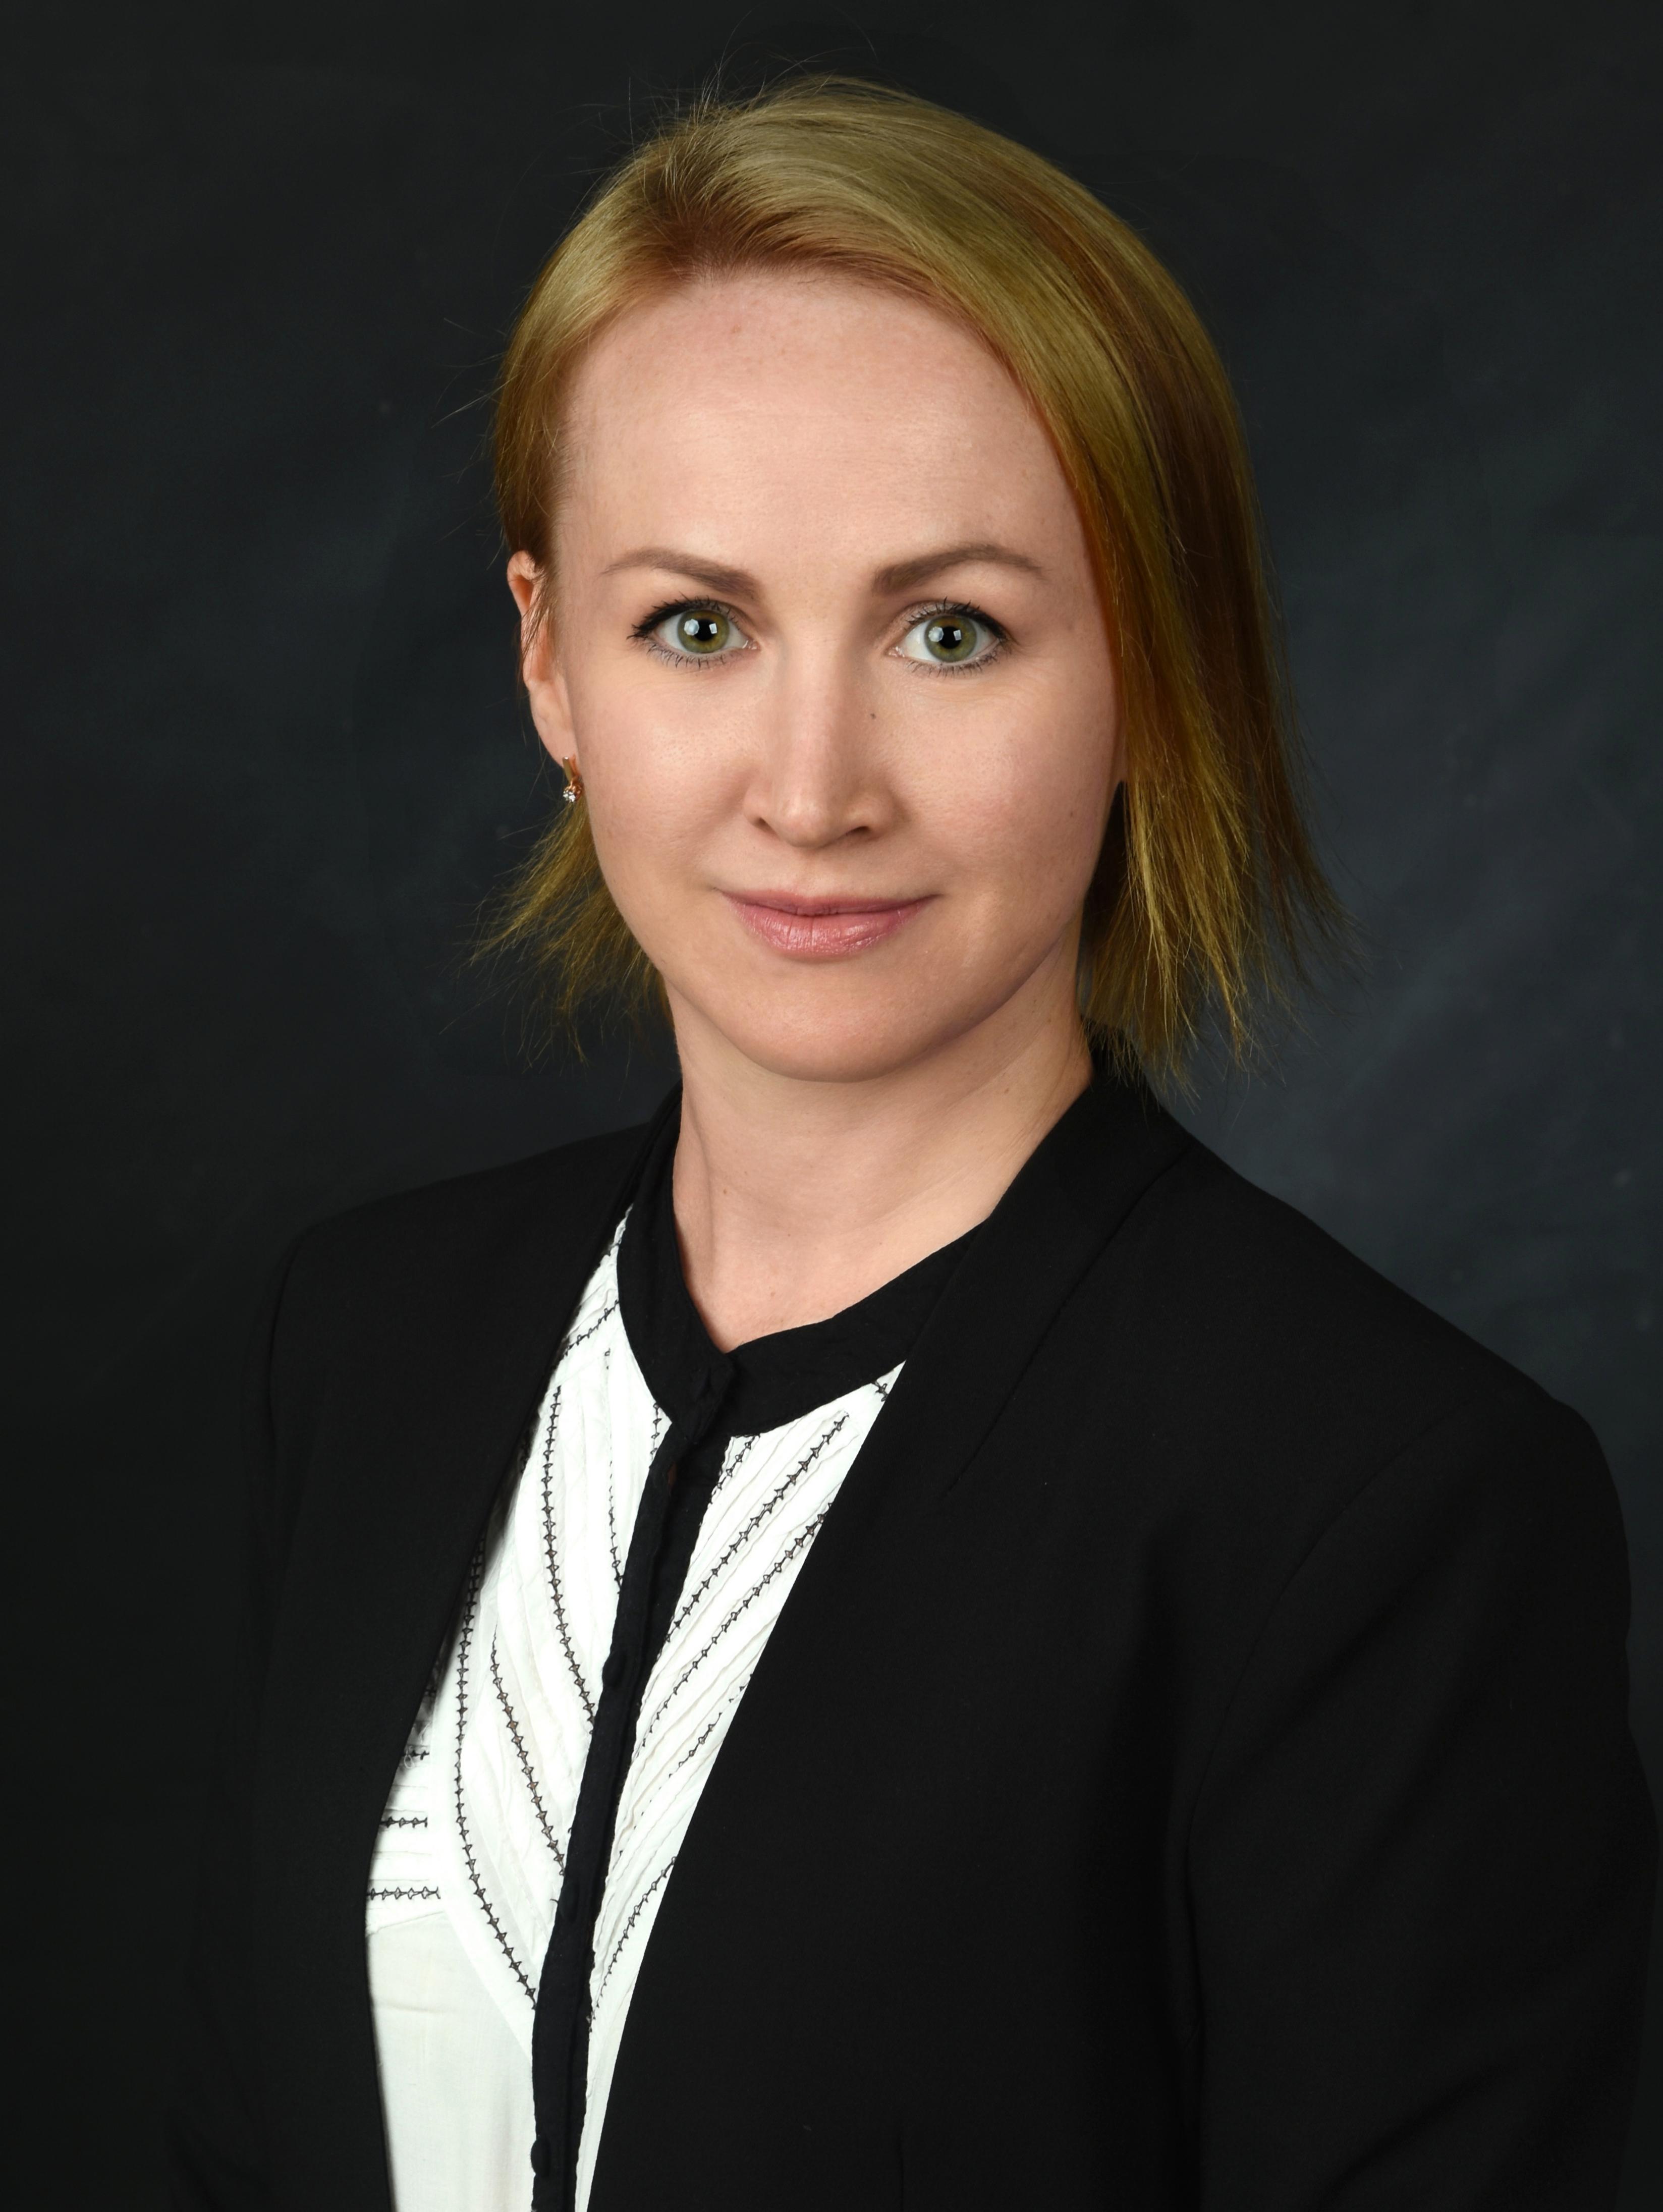 Portrait von Irina Tkaciova